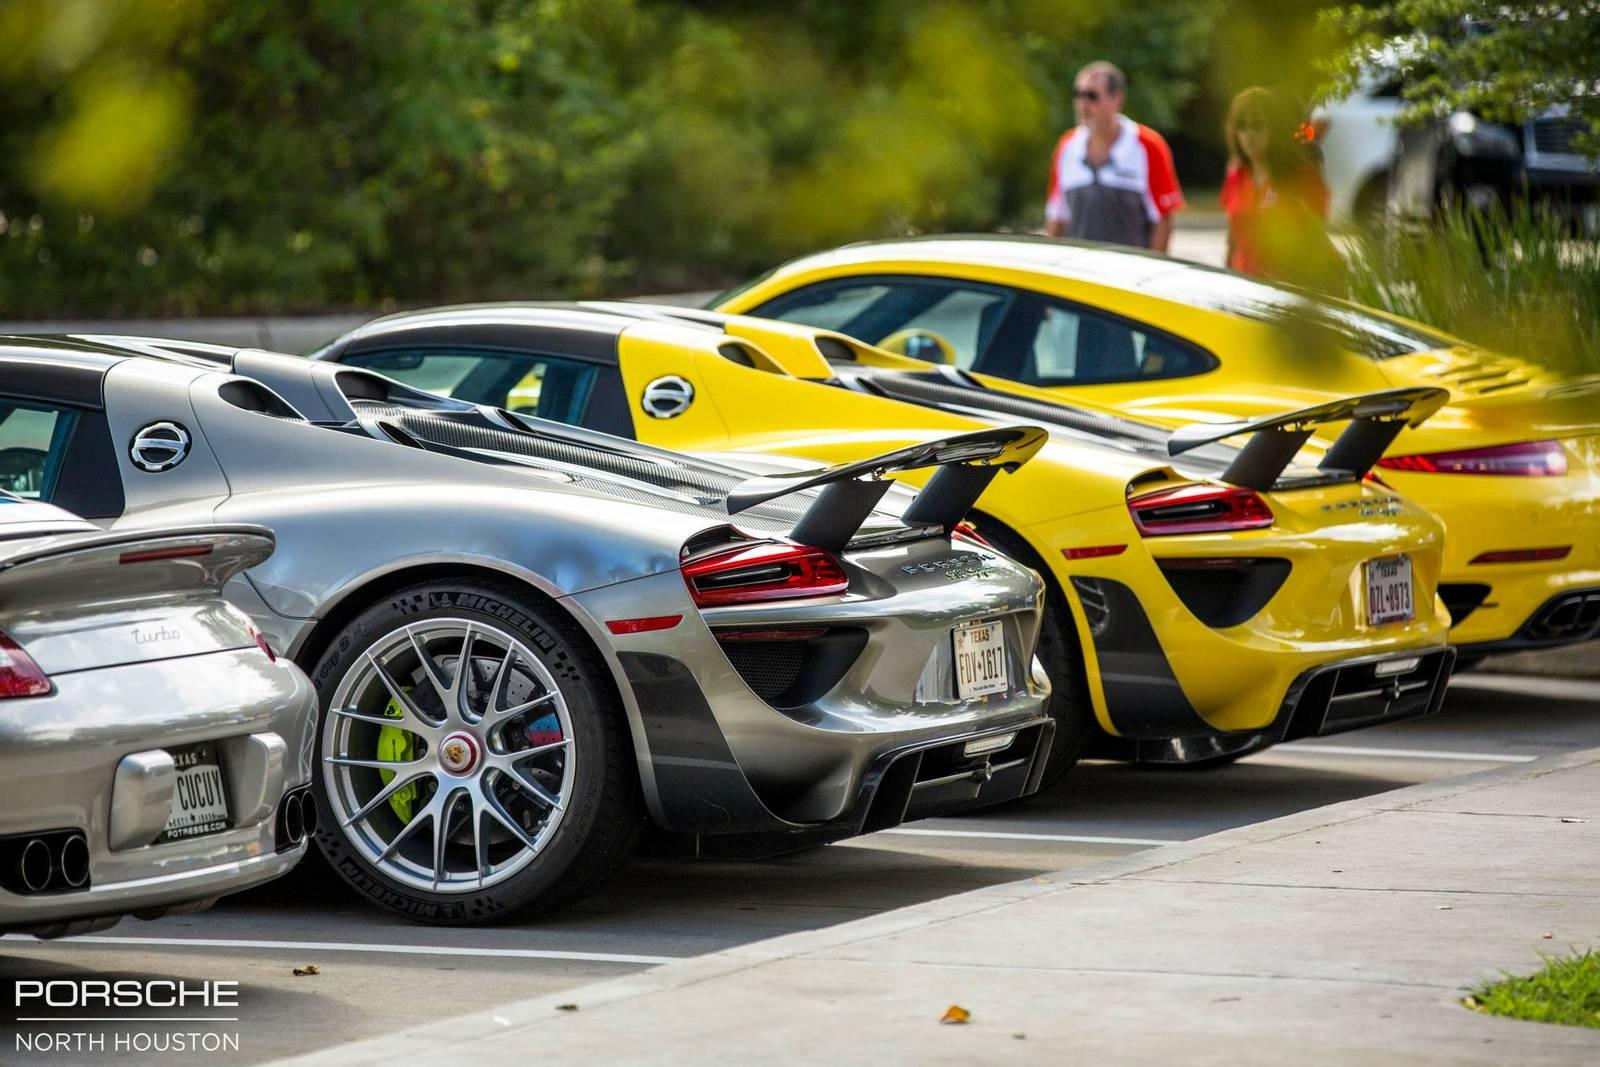 Porsche 918 Spyder rear